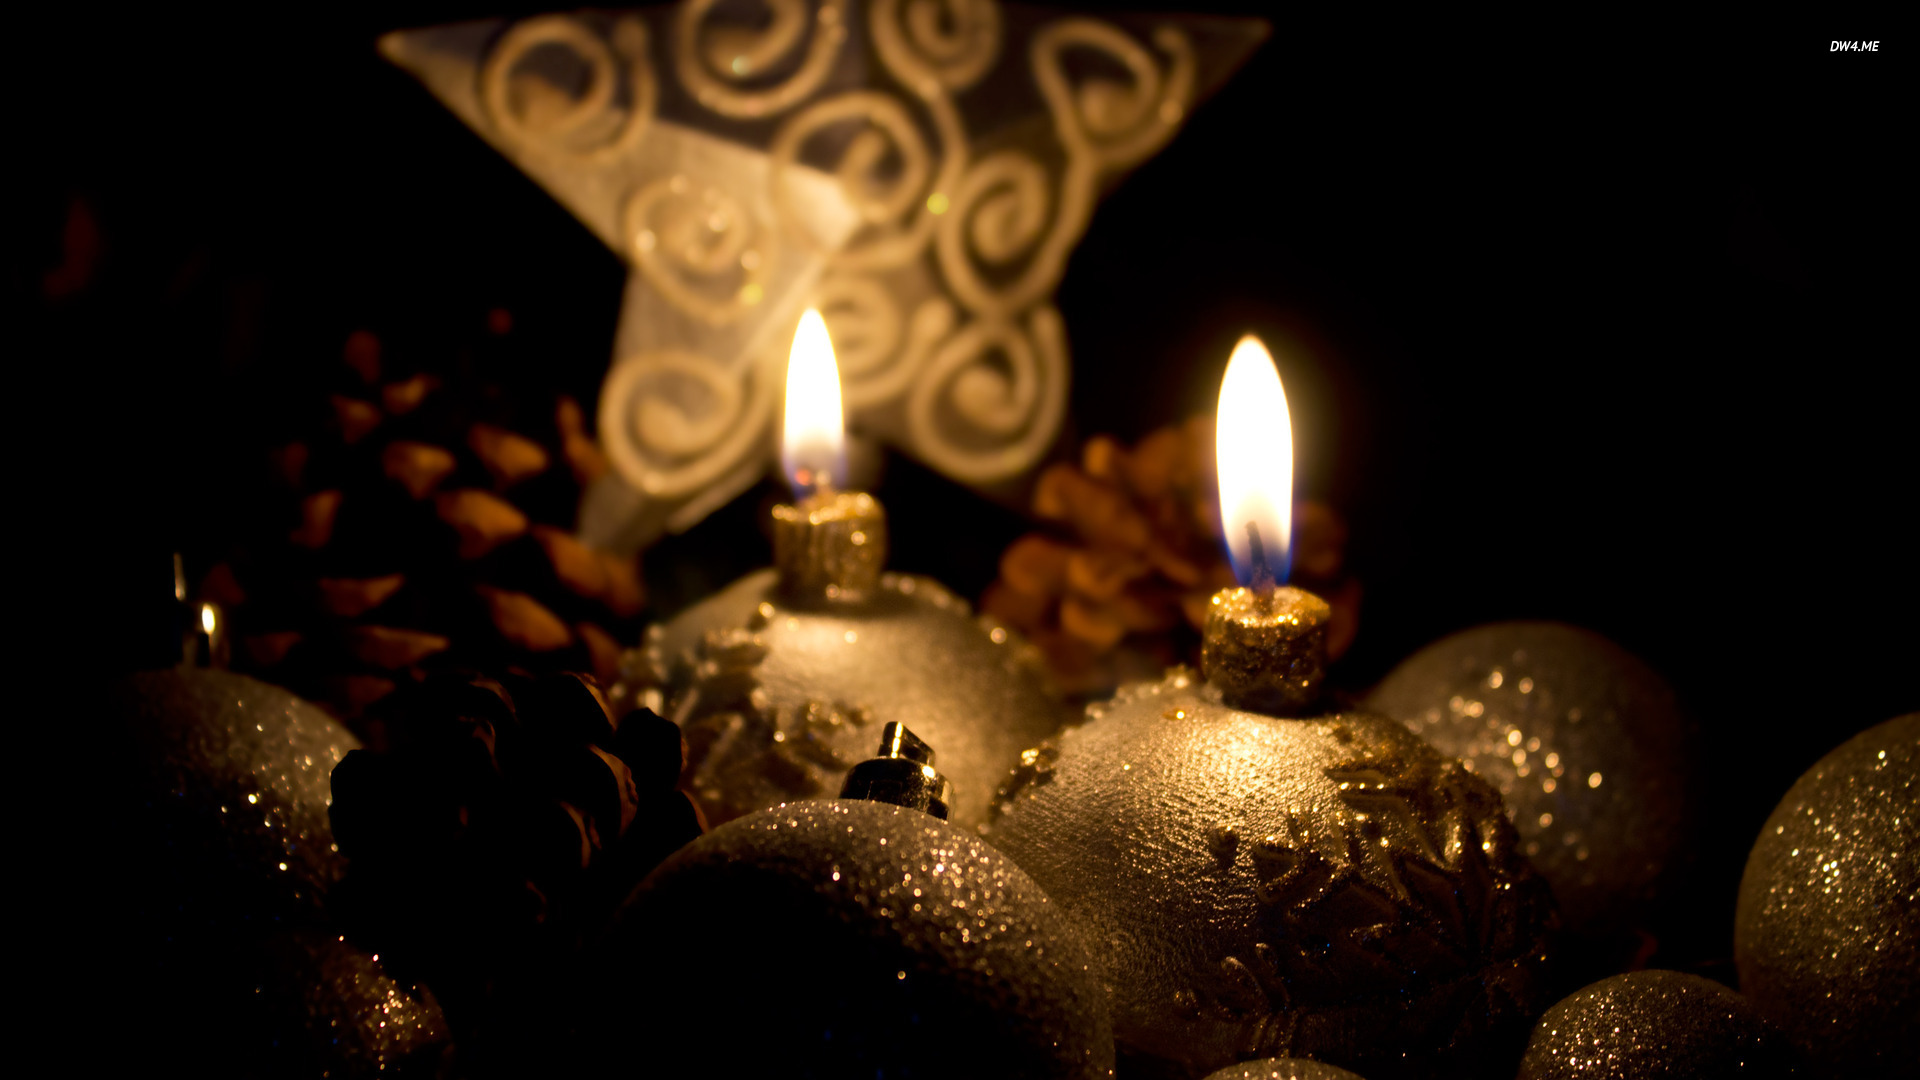 christmas candle wallpaper 2015   Grasscloth Wallpaper 1920x1080